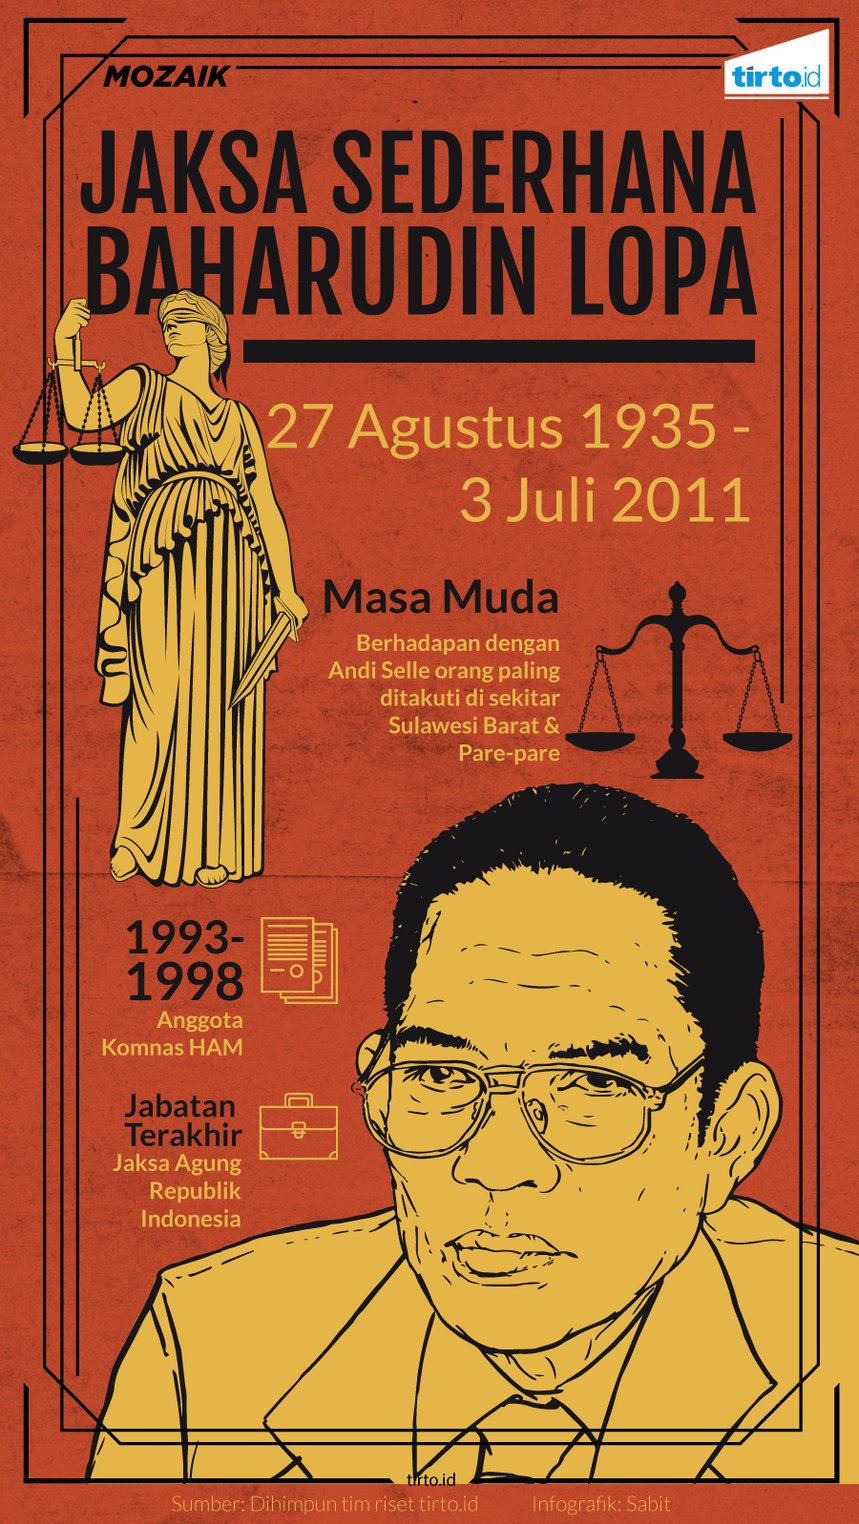 Baharudin Lopa Jaksa Agung Kejujuran Dan Kesederhanaan Jaksa Agung Baharuddin Lopa Tirto Id